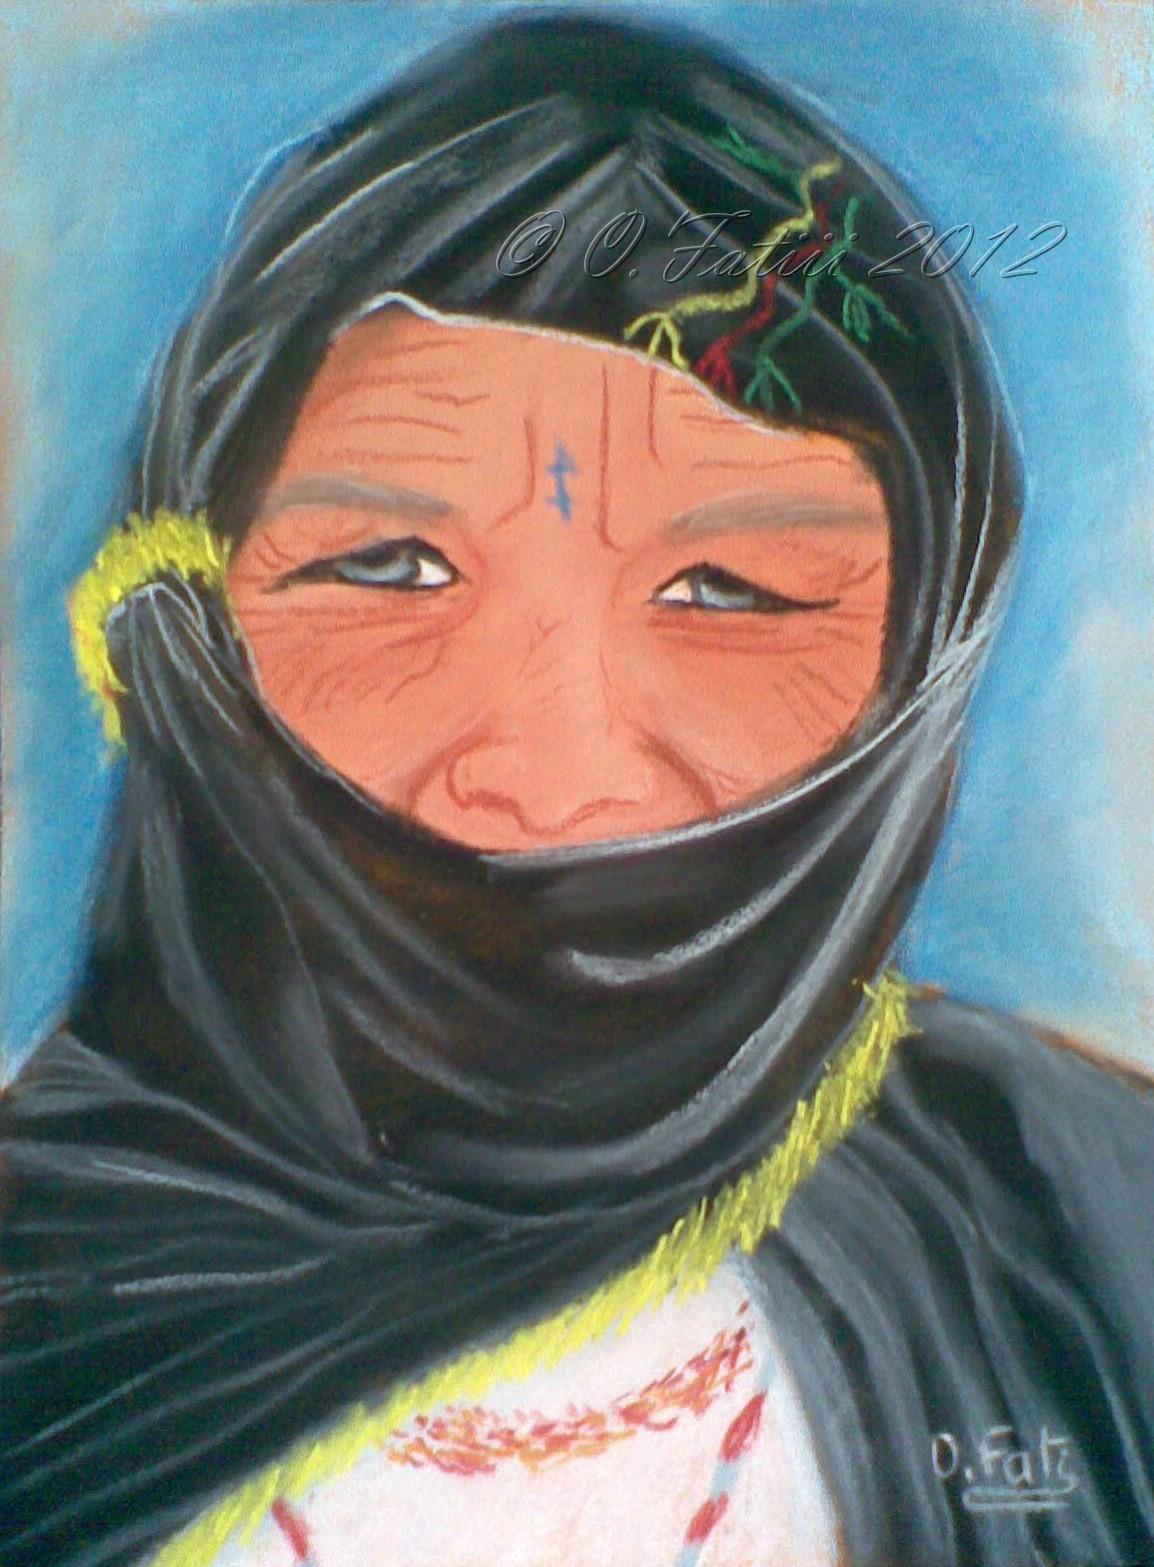 Site de rencontre berbere